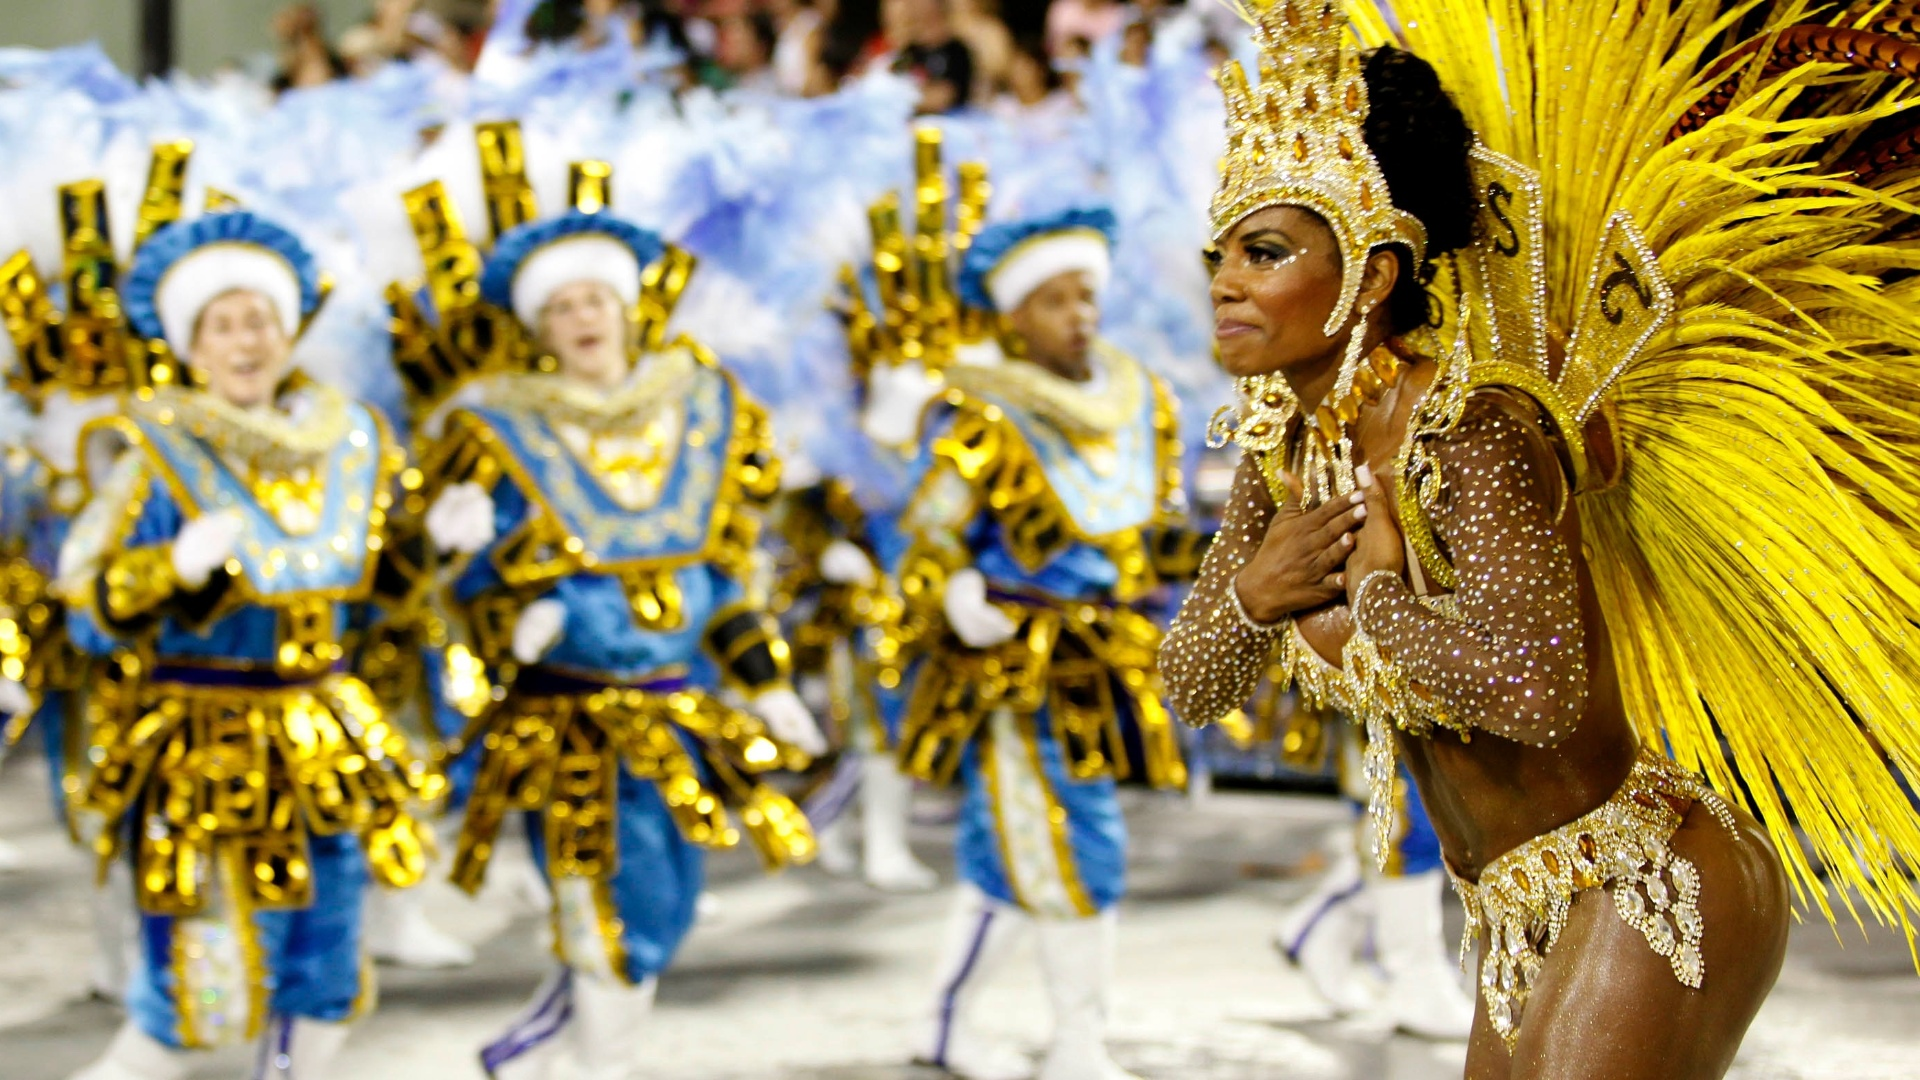 carnaval_de_rio 06.jpg